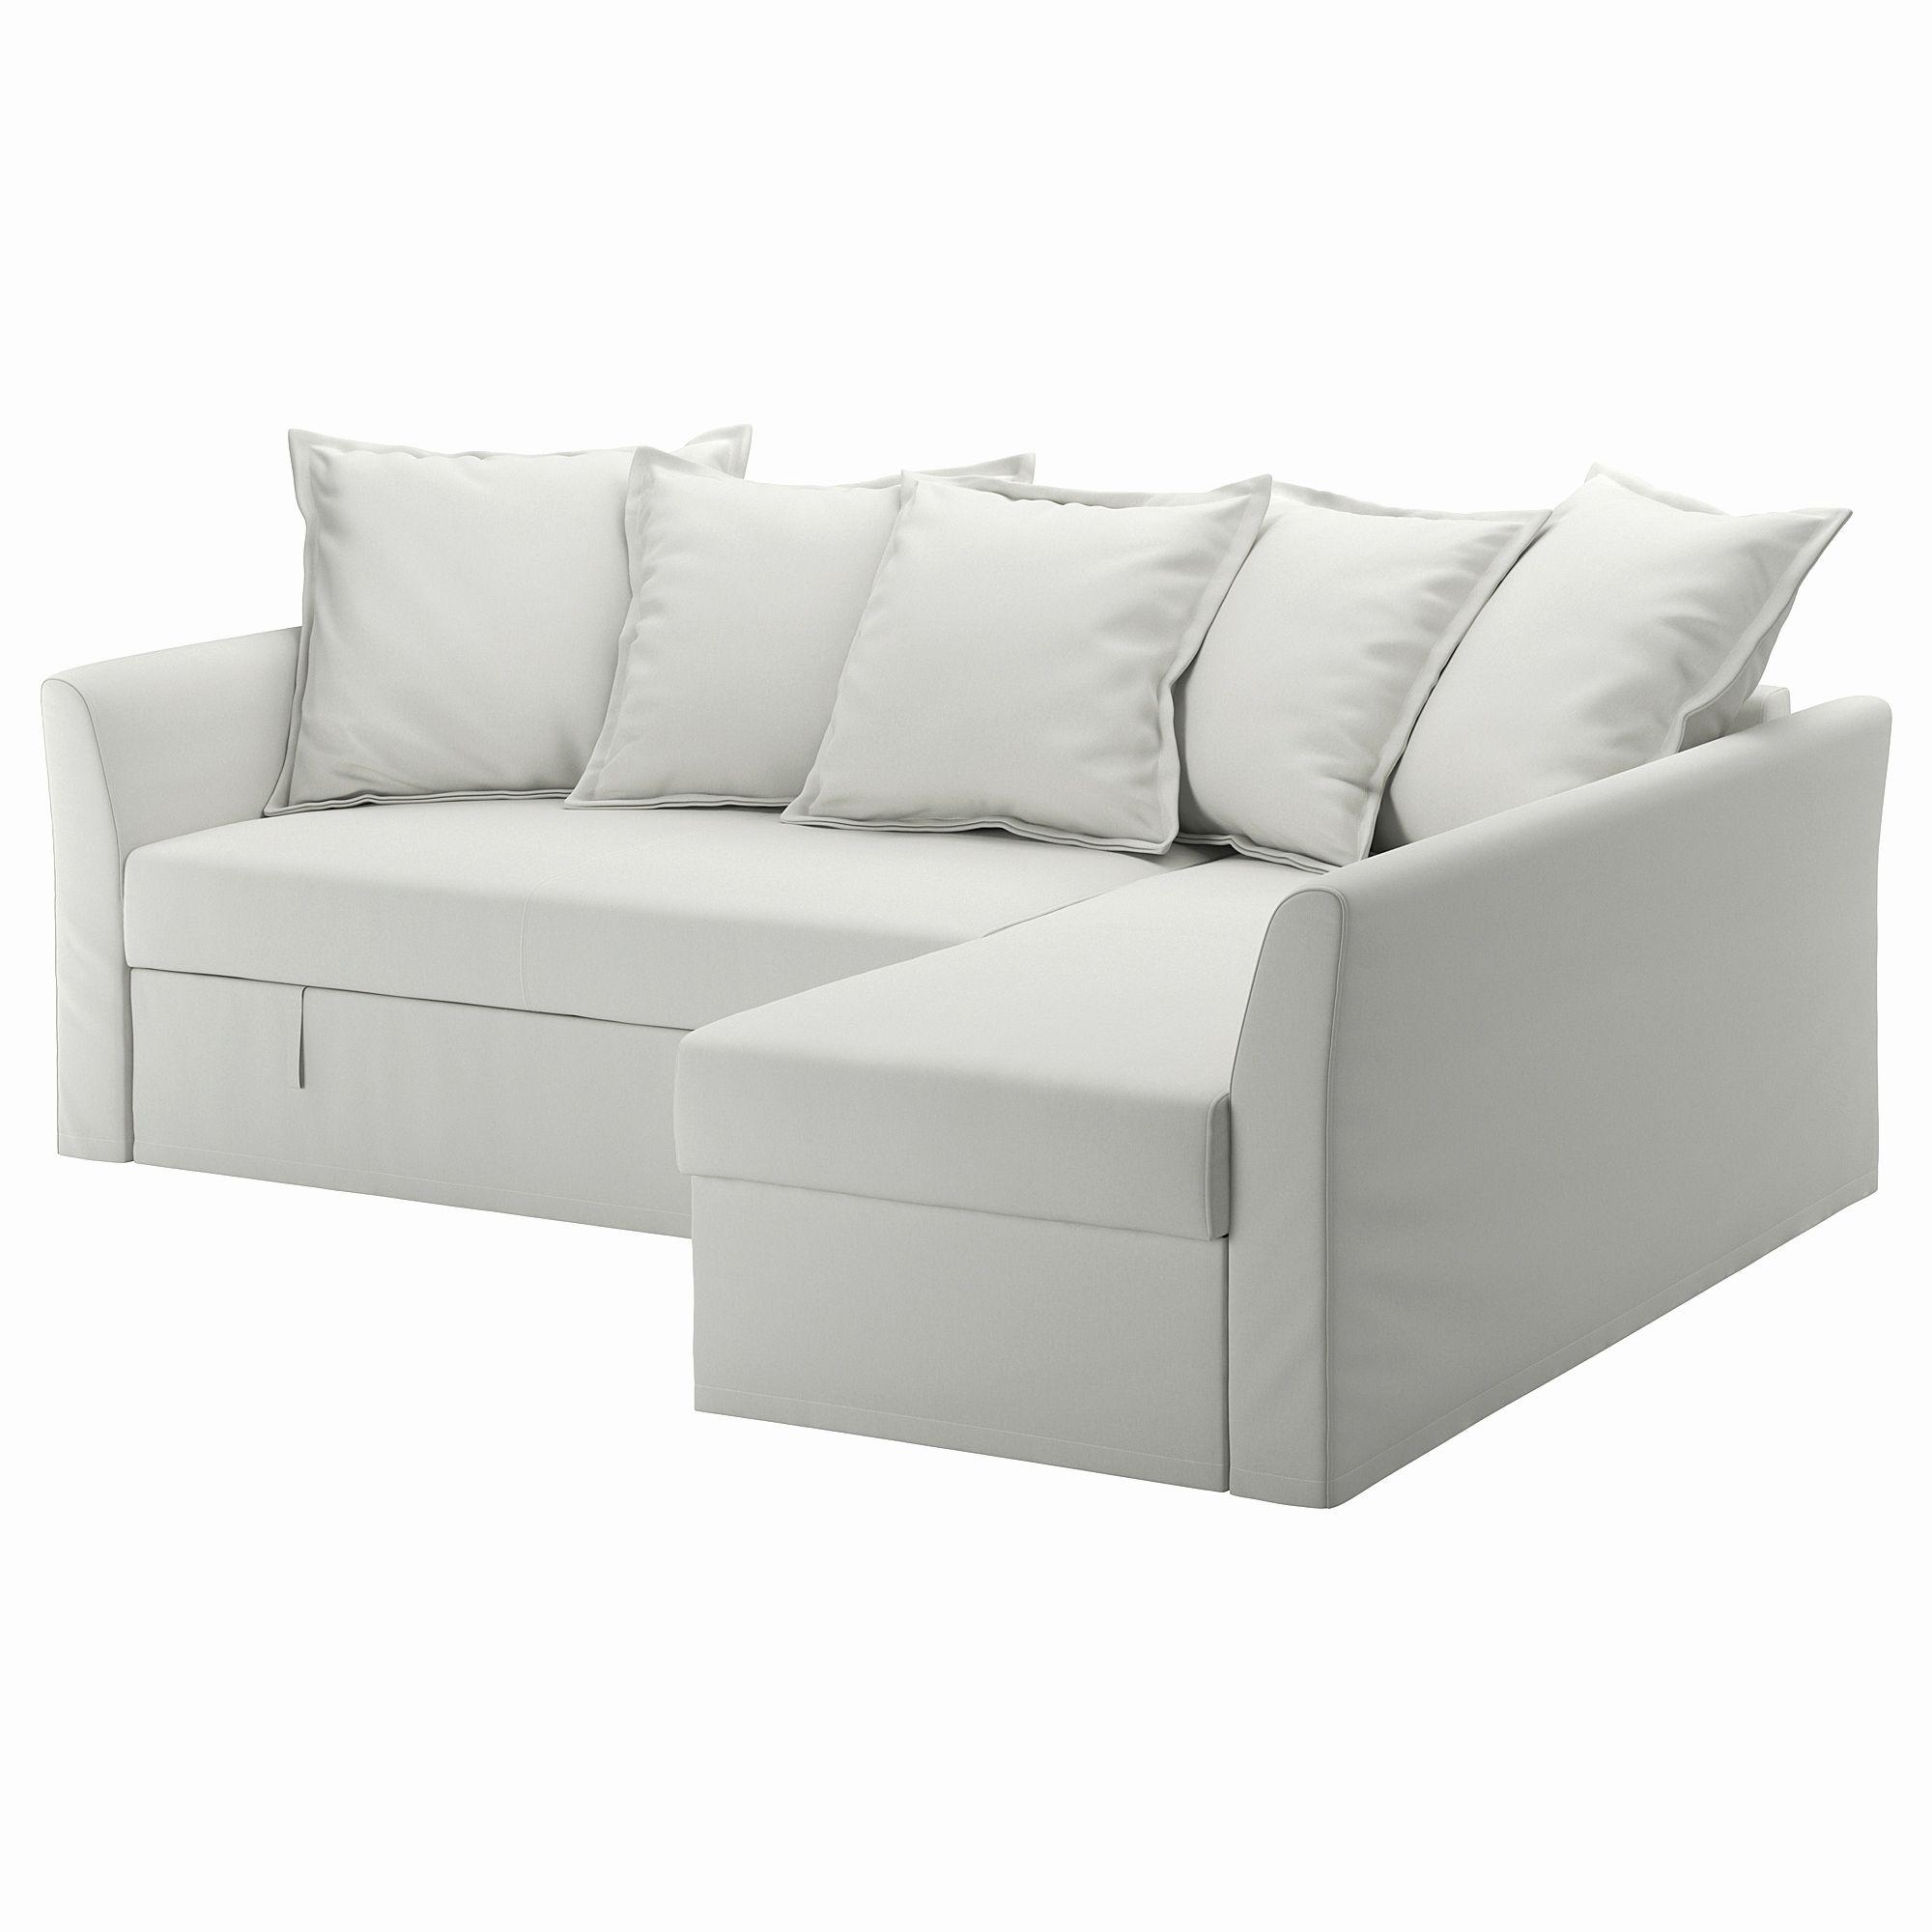 Elegant Chair Sleeper Sofa Pics Chair Sleeper Sofa Luxury Sleeper